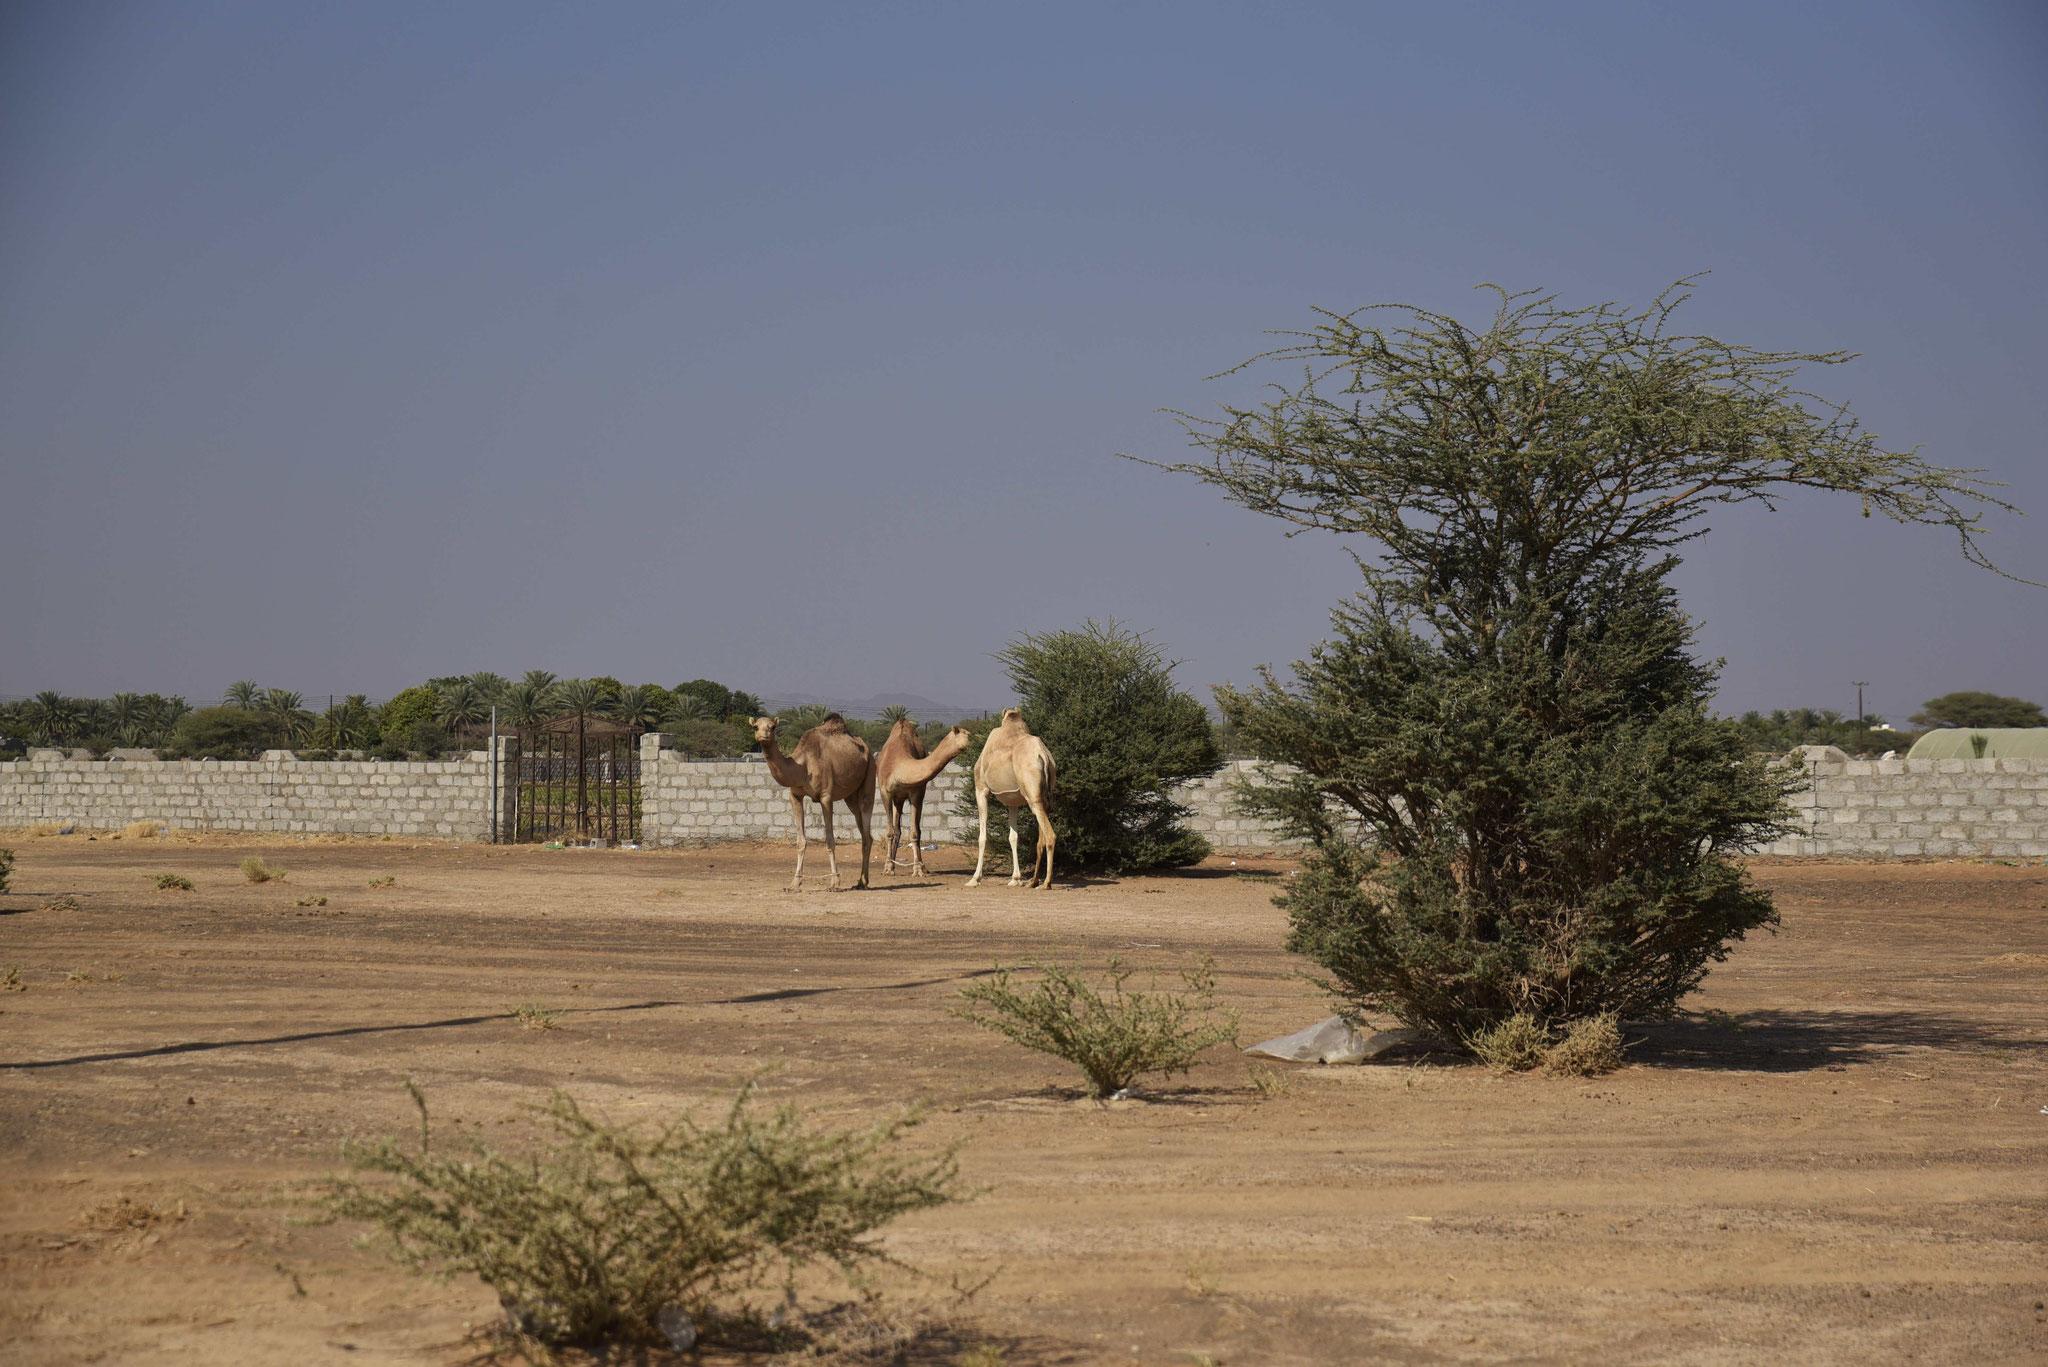 Freilaufende Kamele am Wegesrand